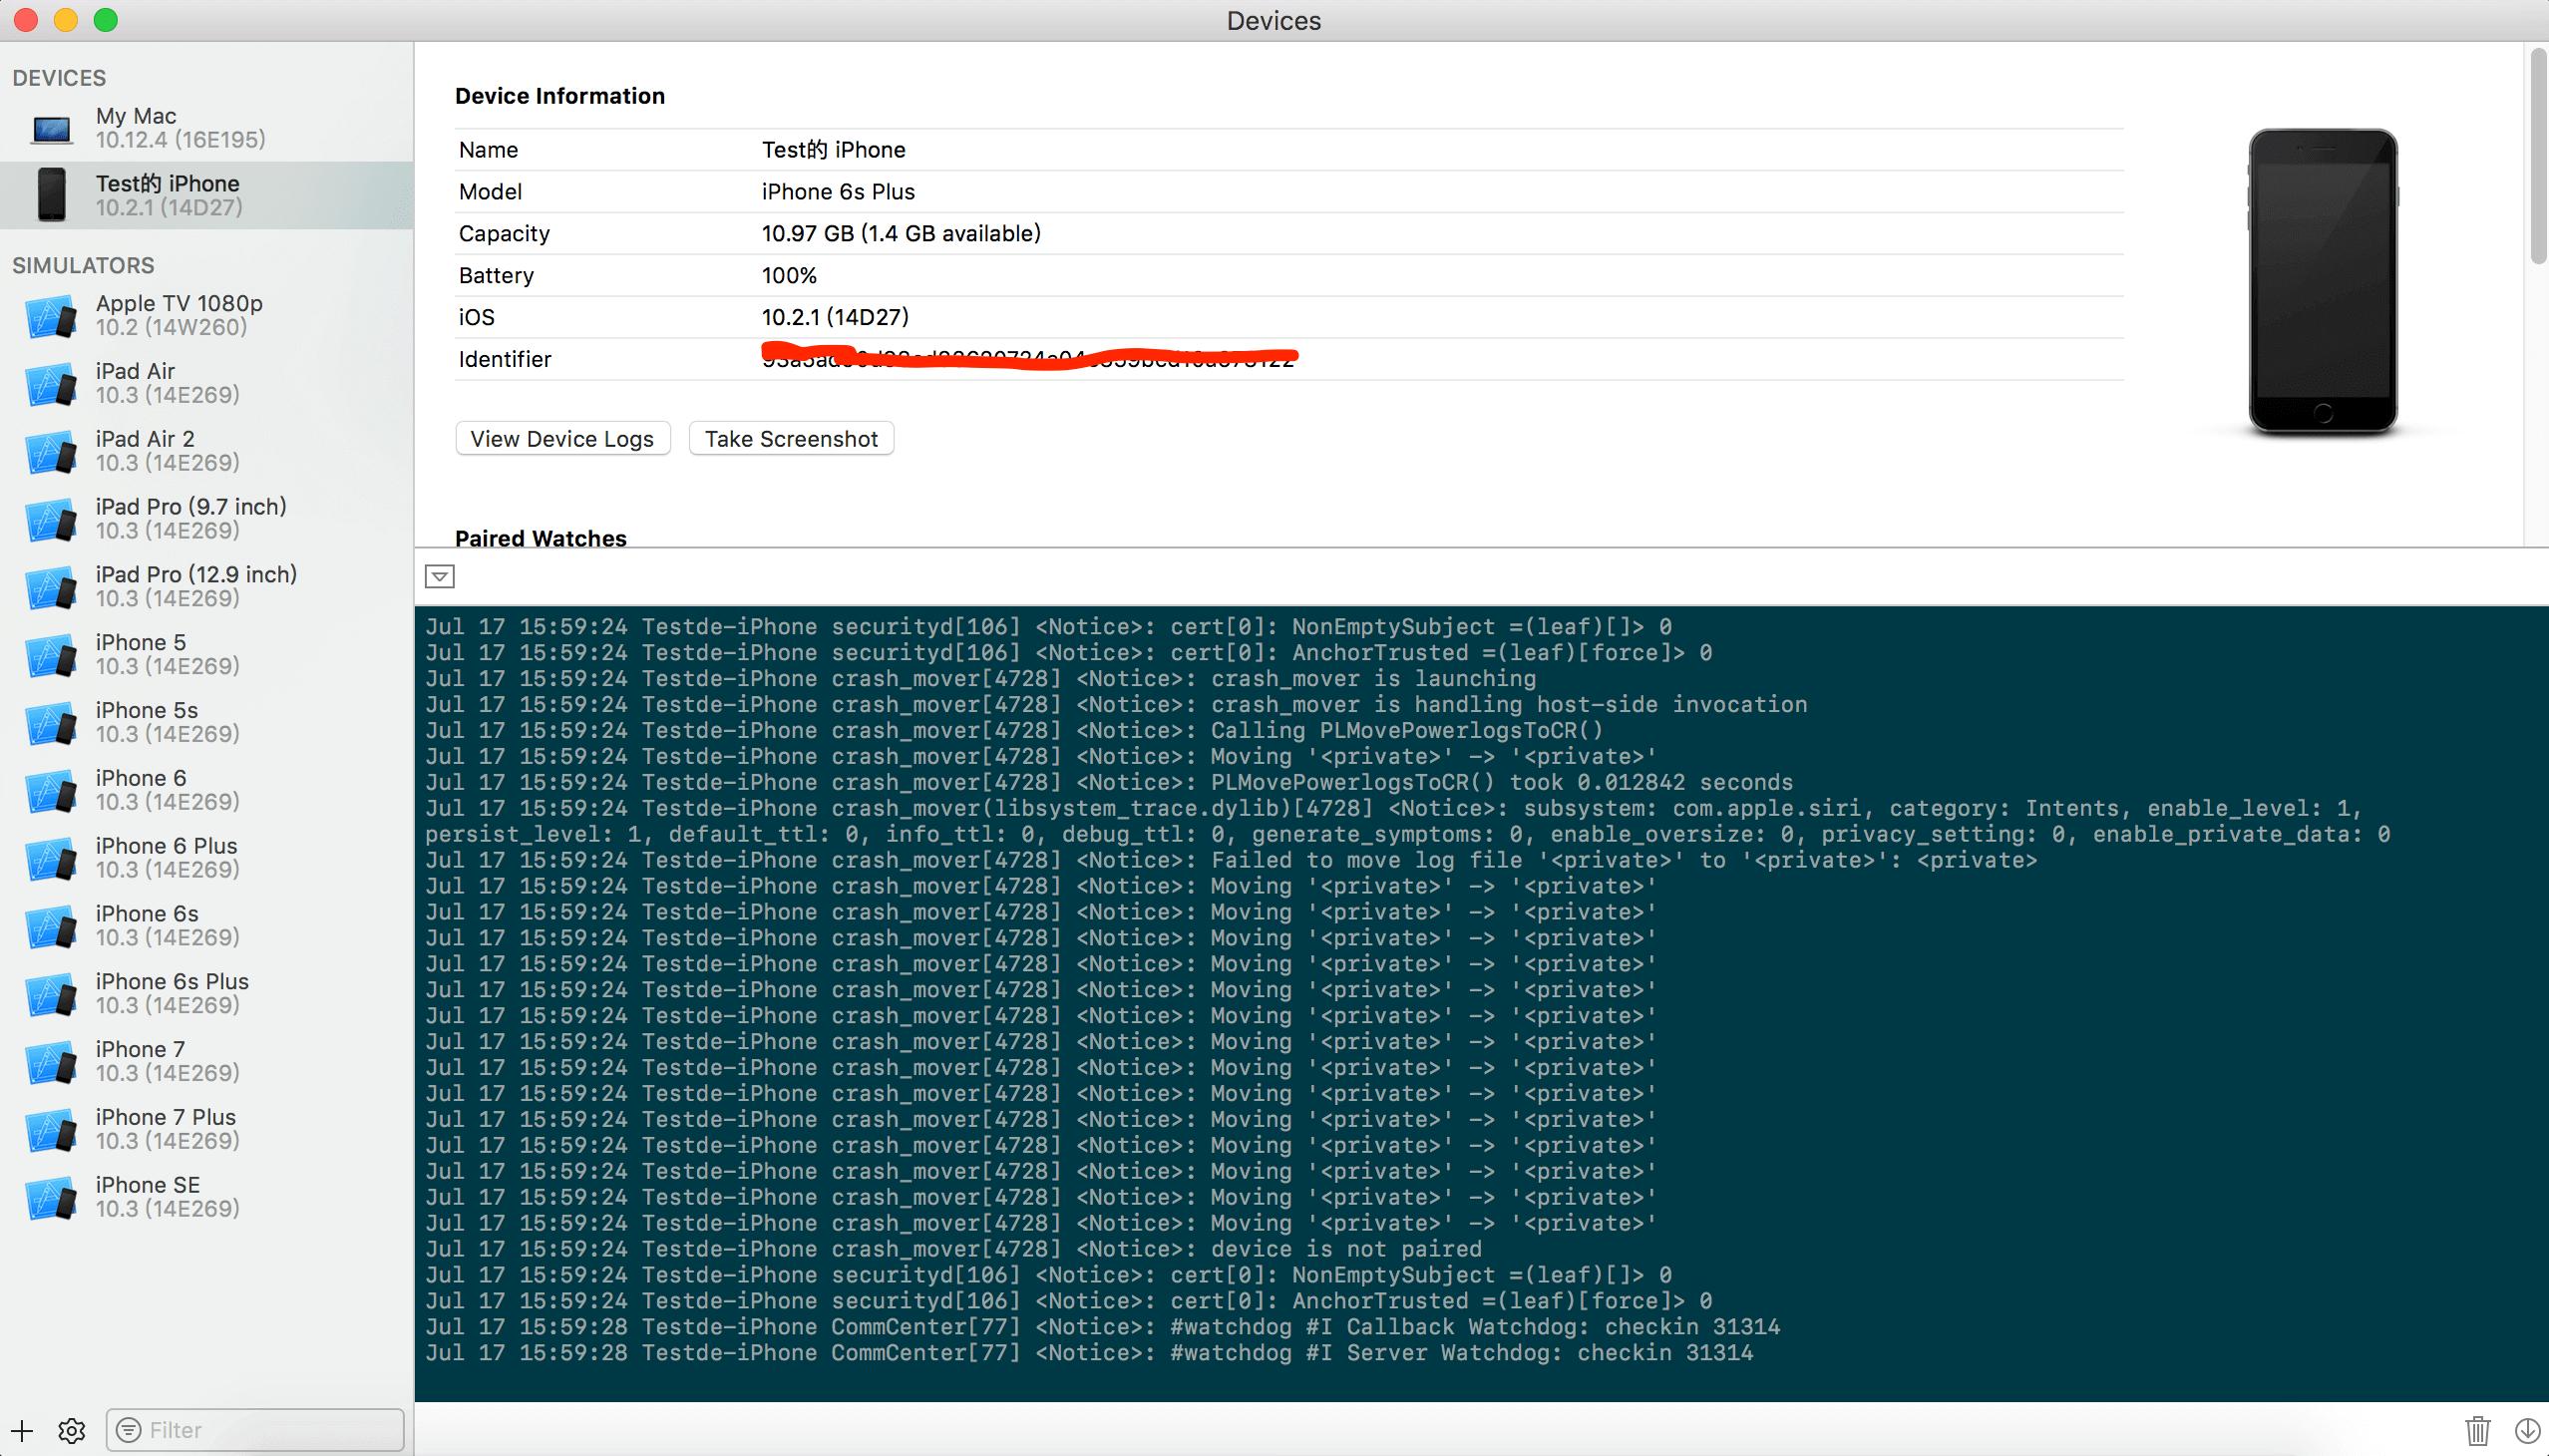 Devices查看log